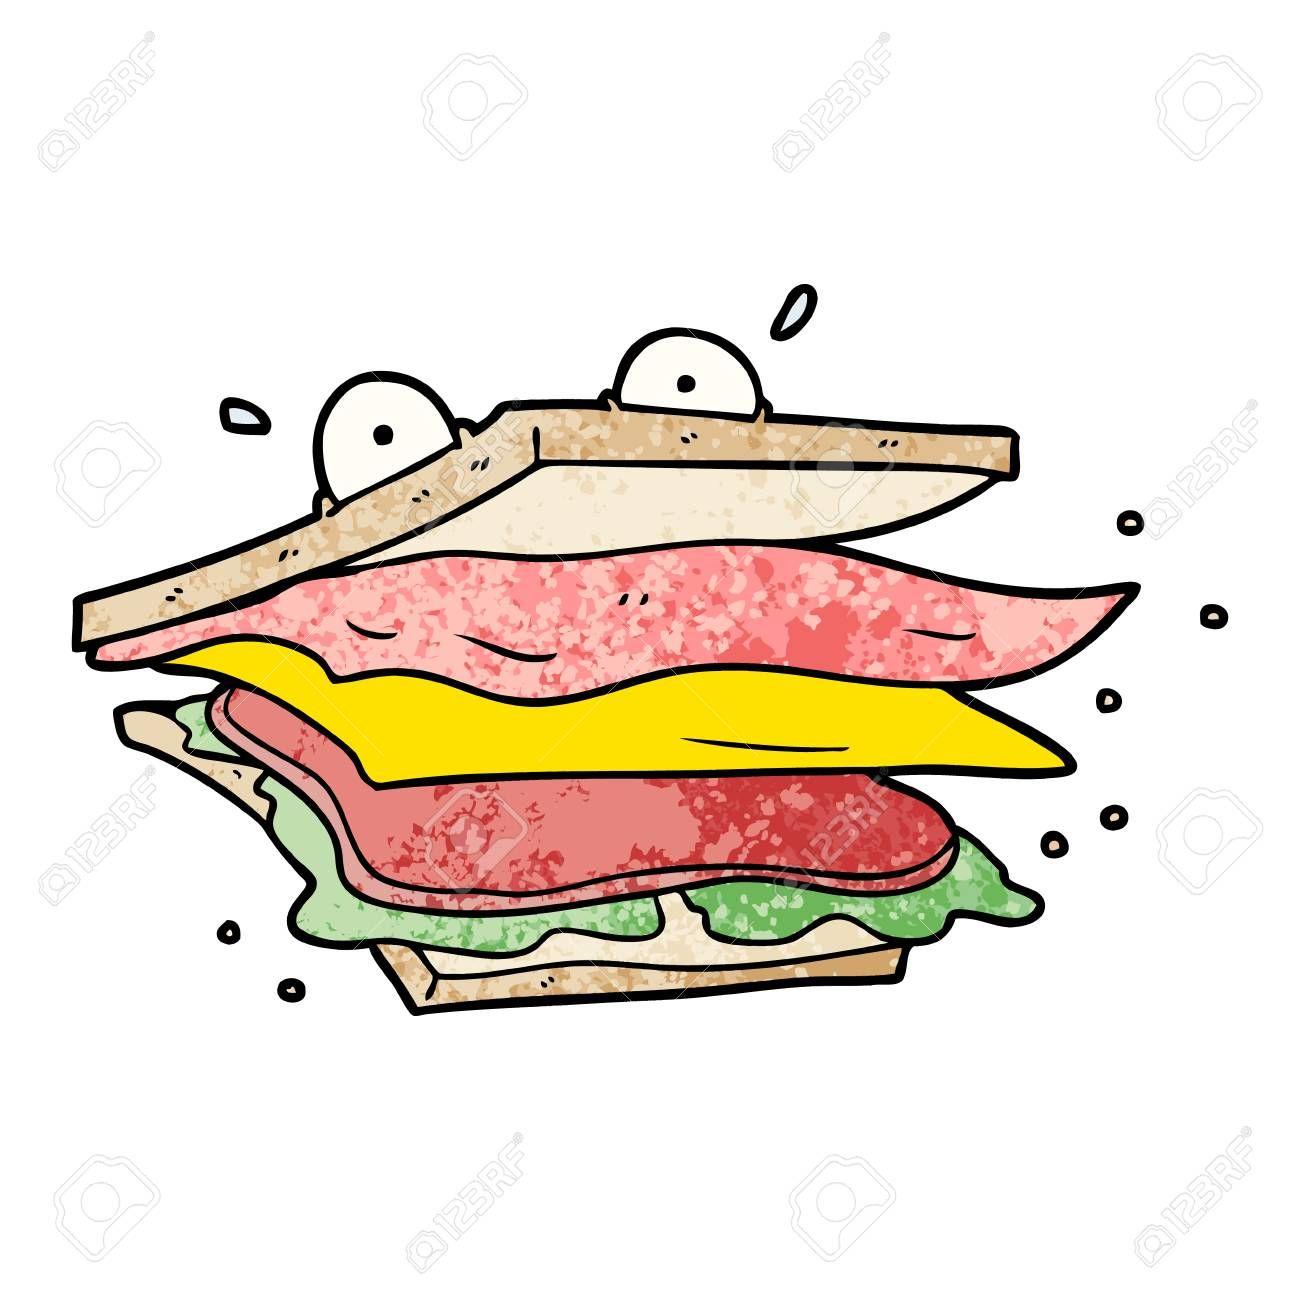 sandwich cartoon character illustration sponsored cartoon sandwich illustration character character illustration cartoon characters photos for sale pinterest